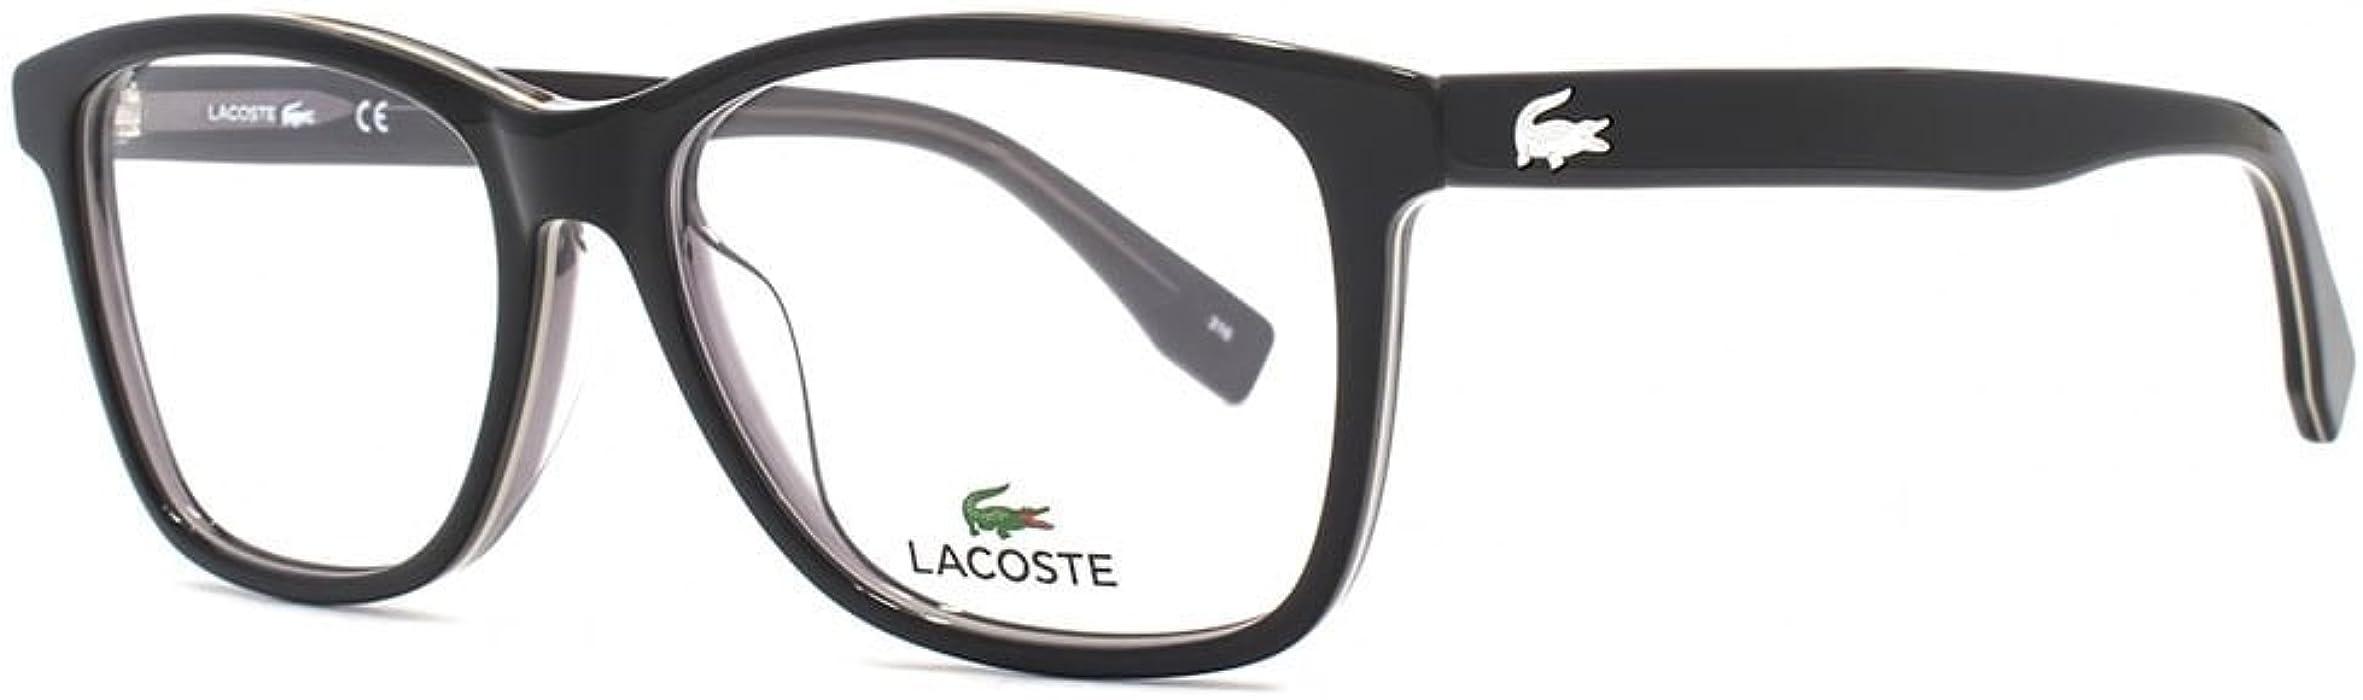 ee4d9b4d59a Eyeglasses LACOSTE L2776 001 BLACK at Amazon Men s Clothing store